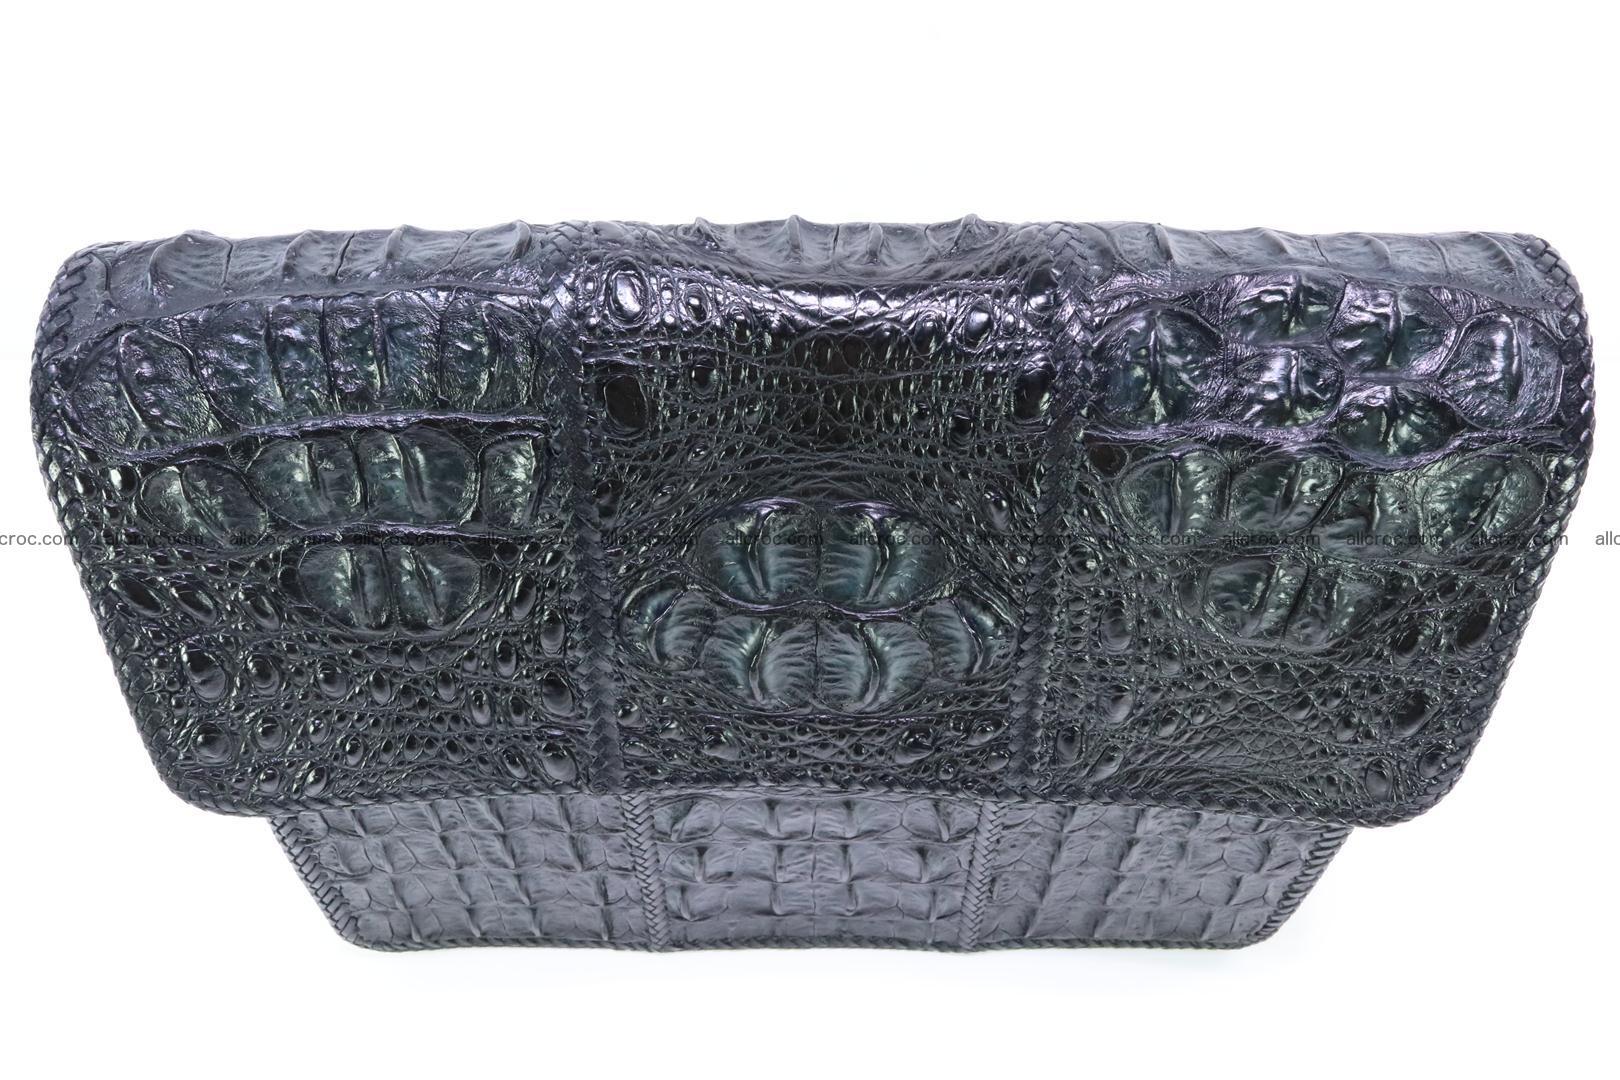 Crocodile skin shoulder bag with braided edges 147 Foto 9